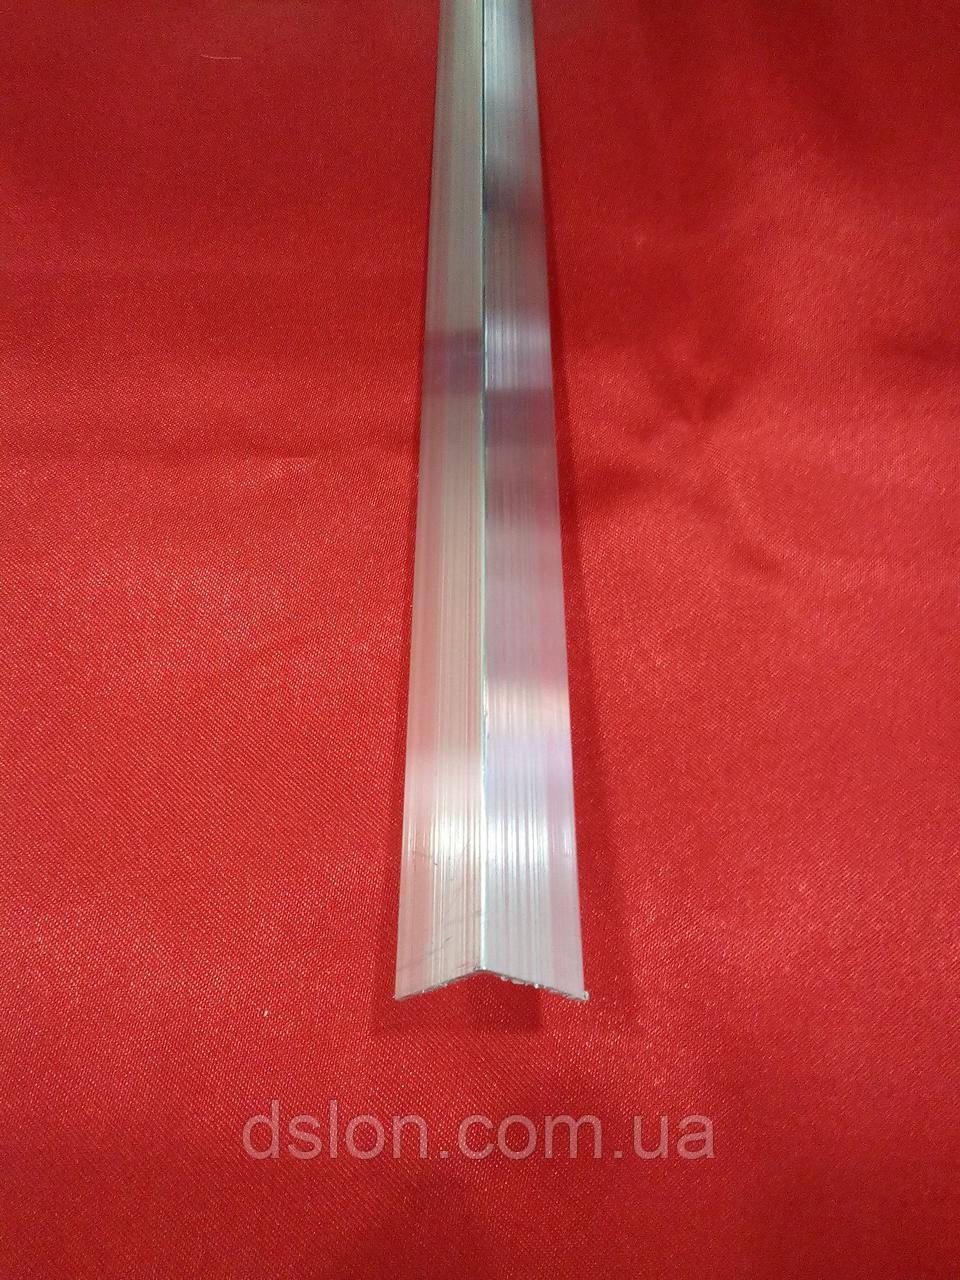 Уголок алюминиевый 15*15*1 мм